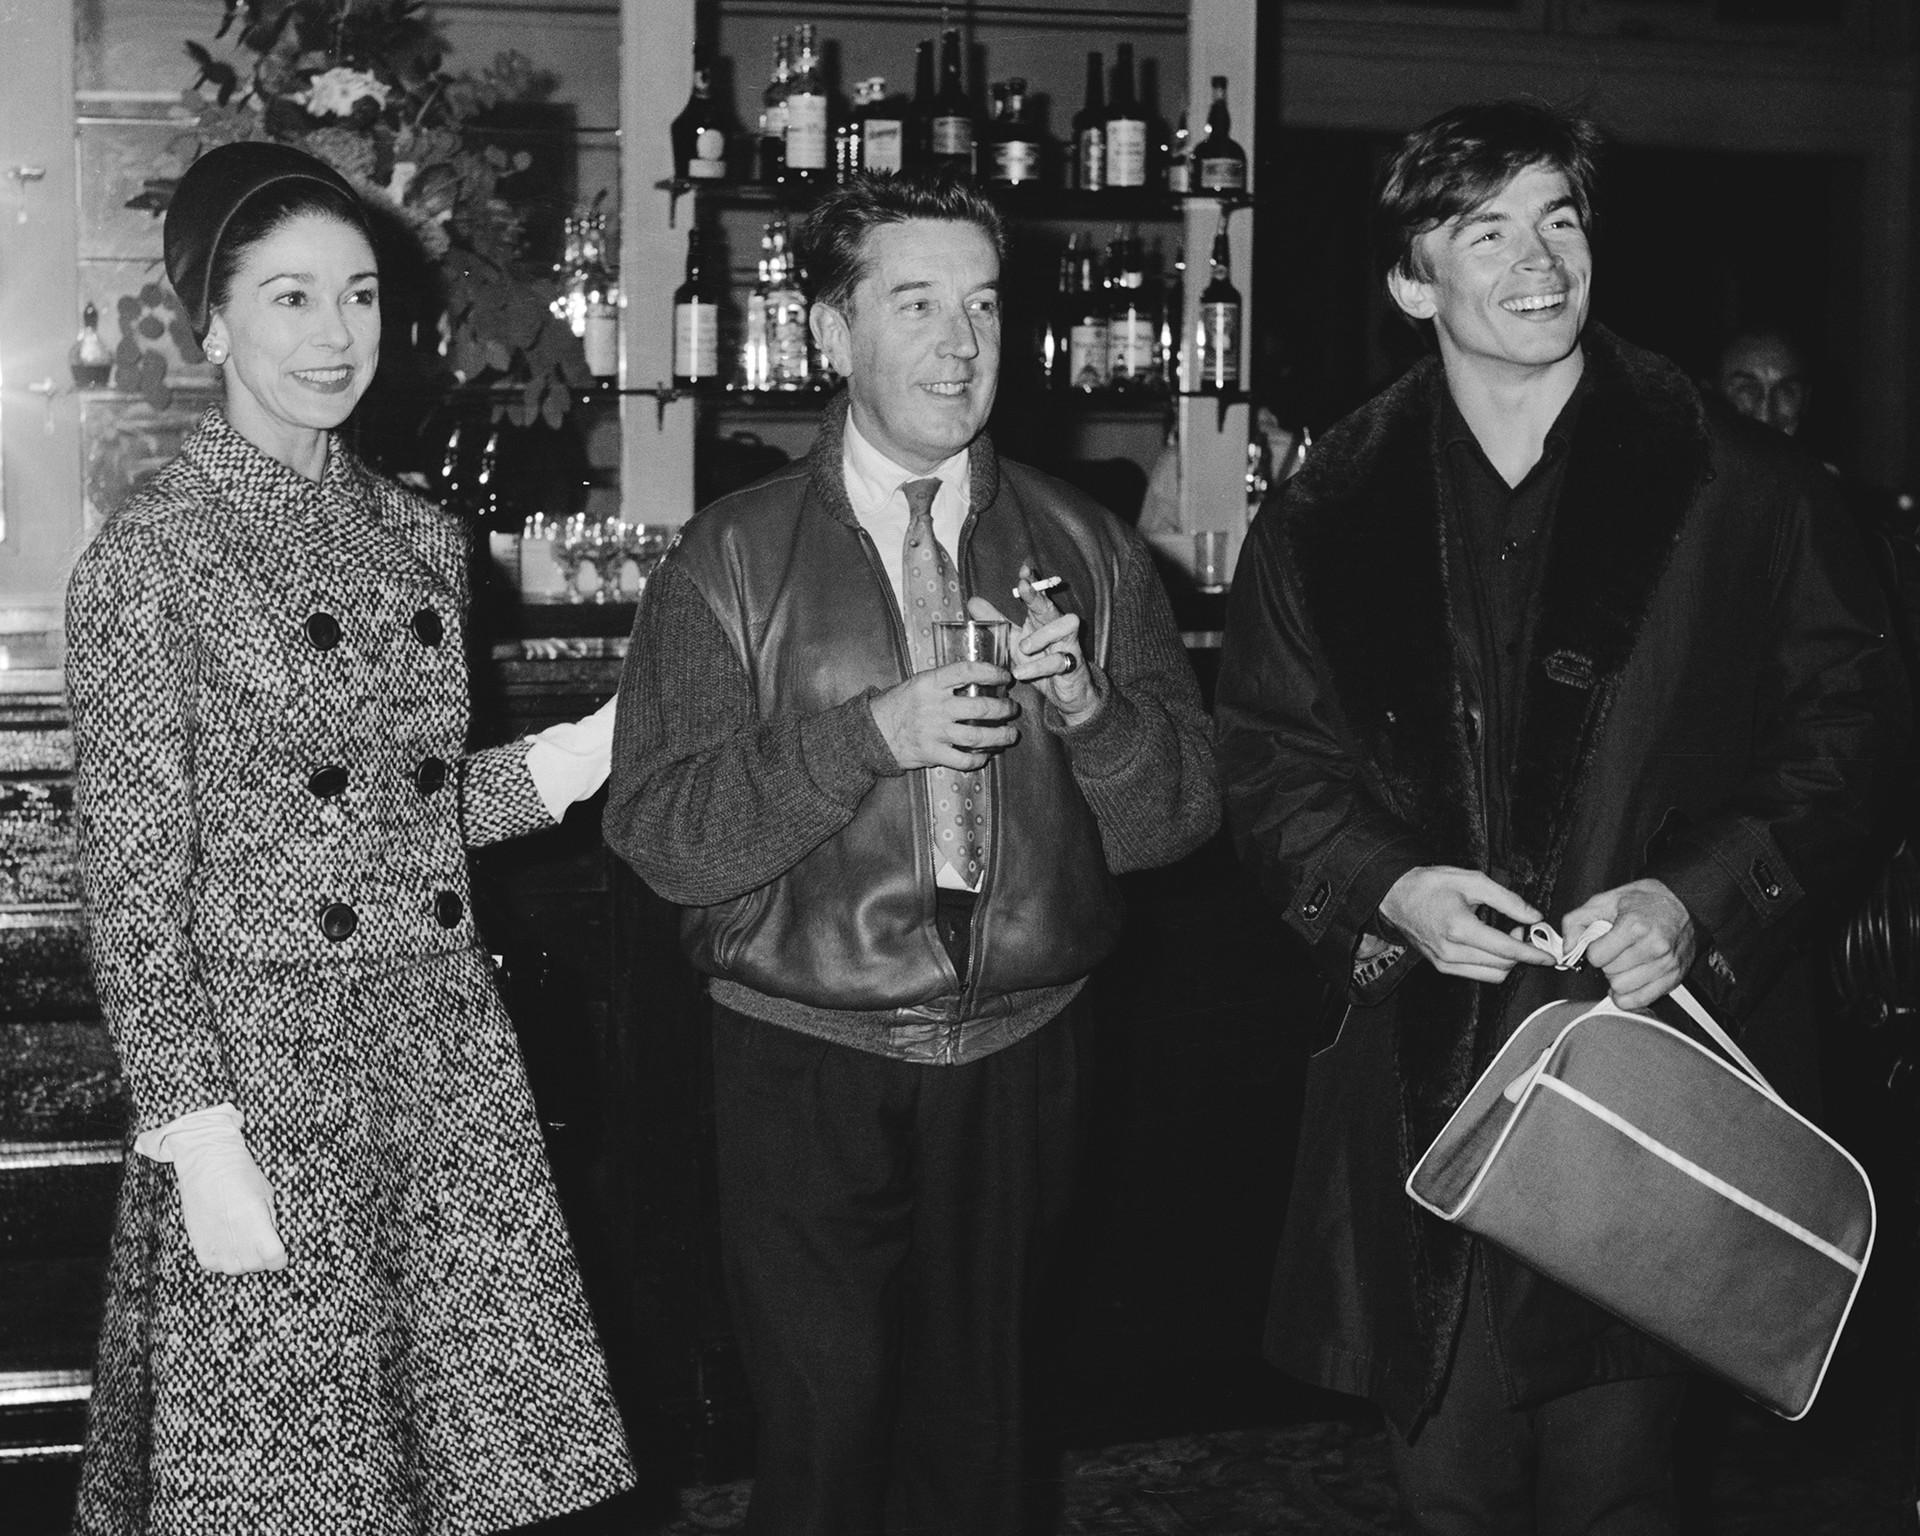 L-R: Dancers Margot Fonteyn, Frederick Ashton and Rudolf Nureyev in London, 1961